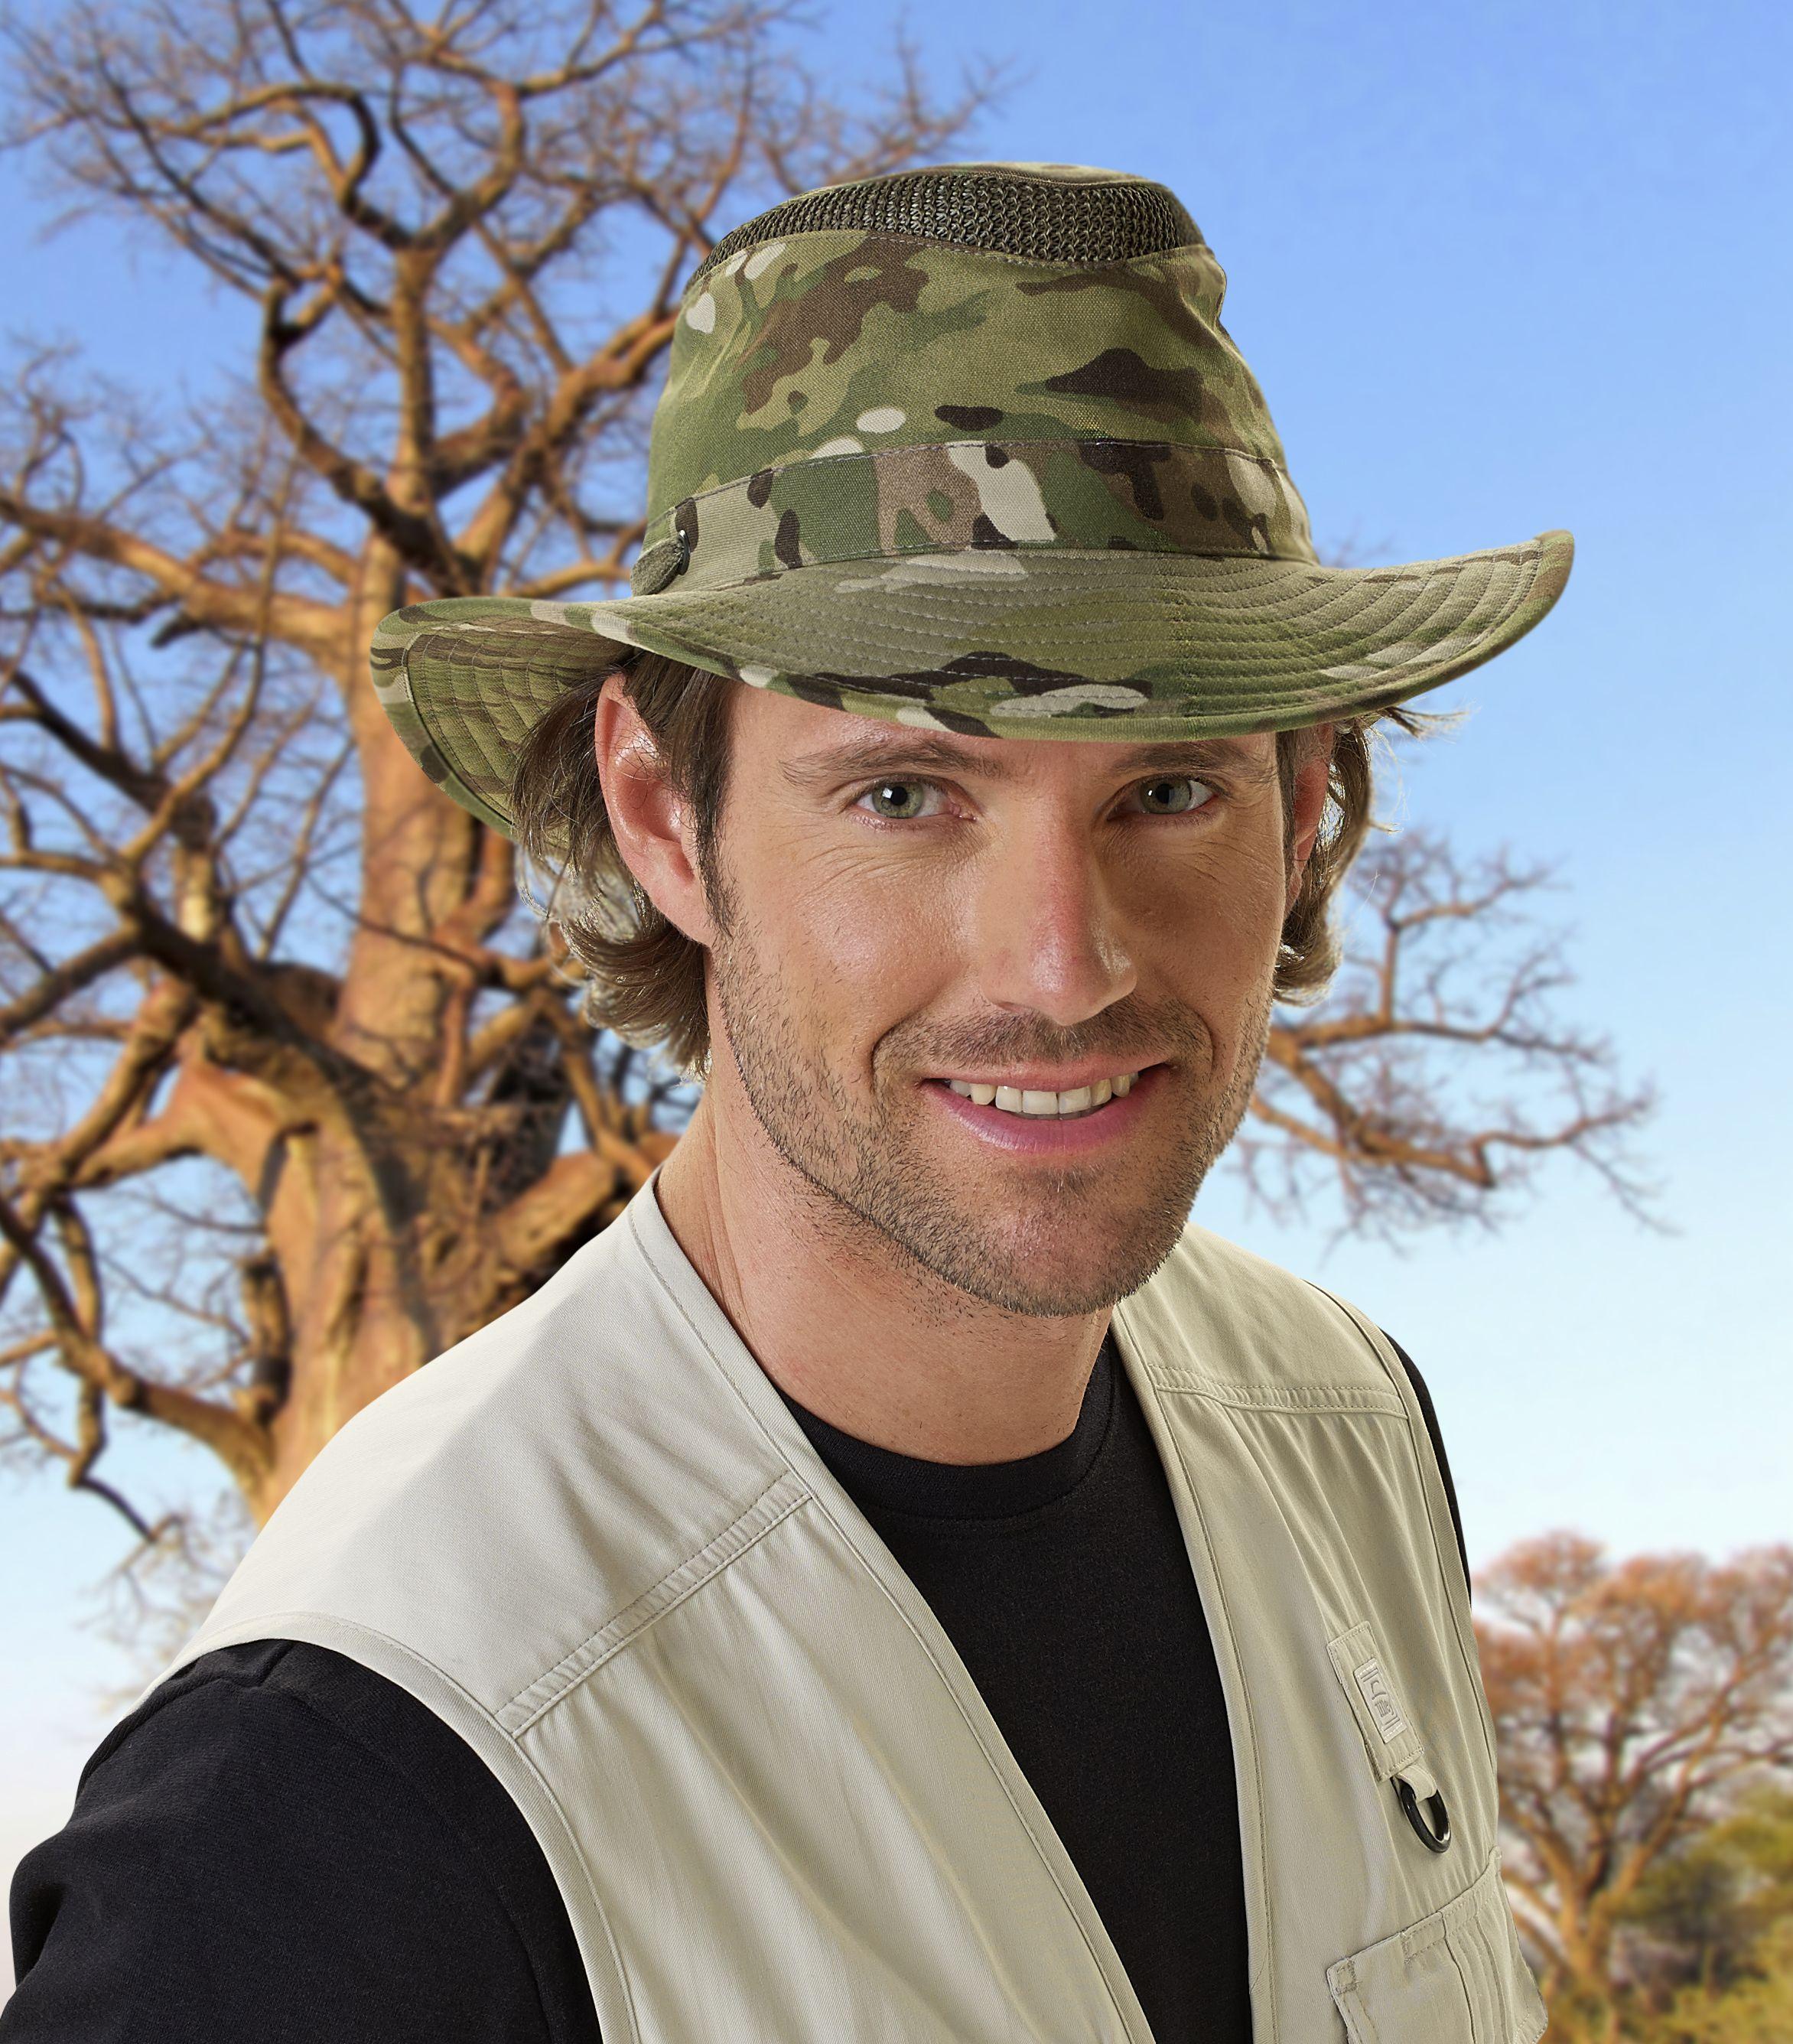 f5aa6424e0ae1f Camouflage yourself with the Tilley LTM6 in camo print. Safari Hat, Camo  Print,